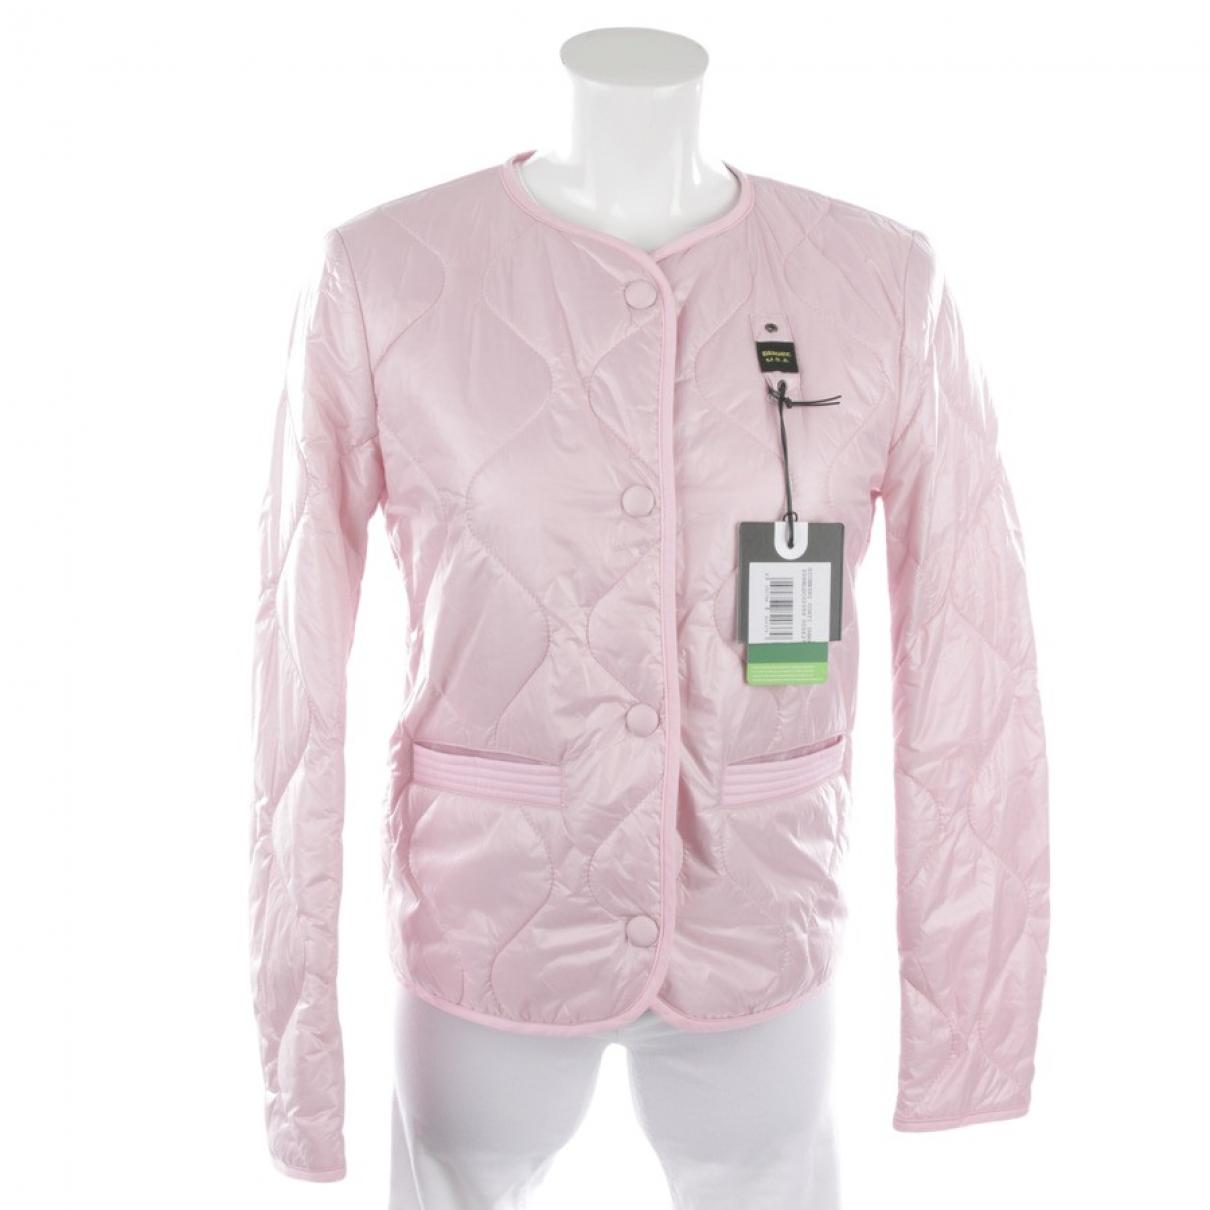 Blauer \N Pink jacket for Women 36 FR